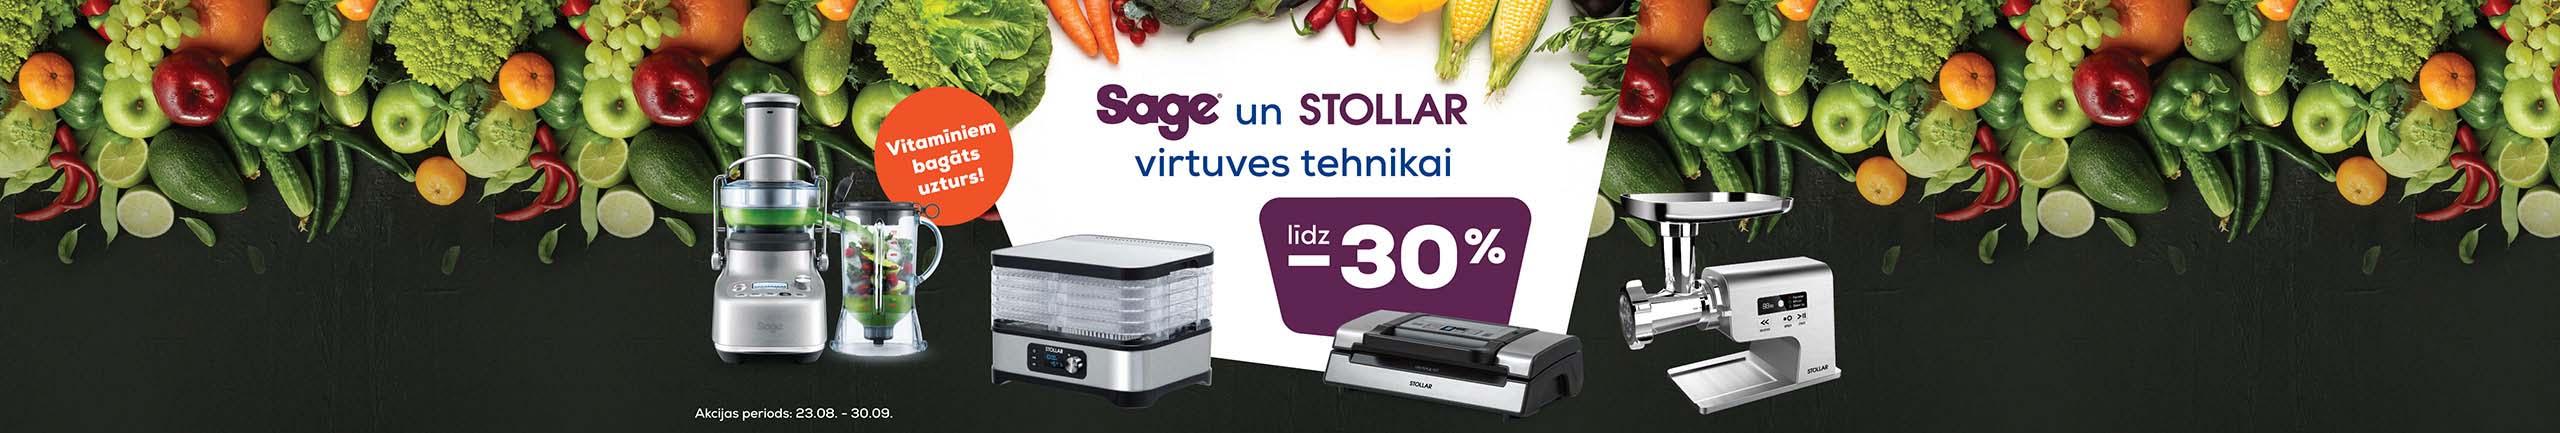 GR Sage/stollar